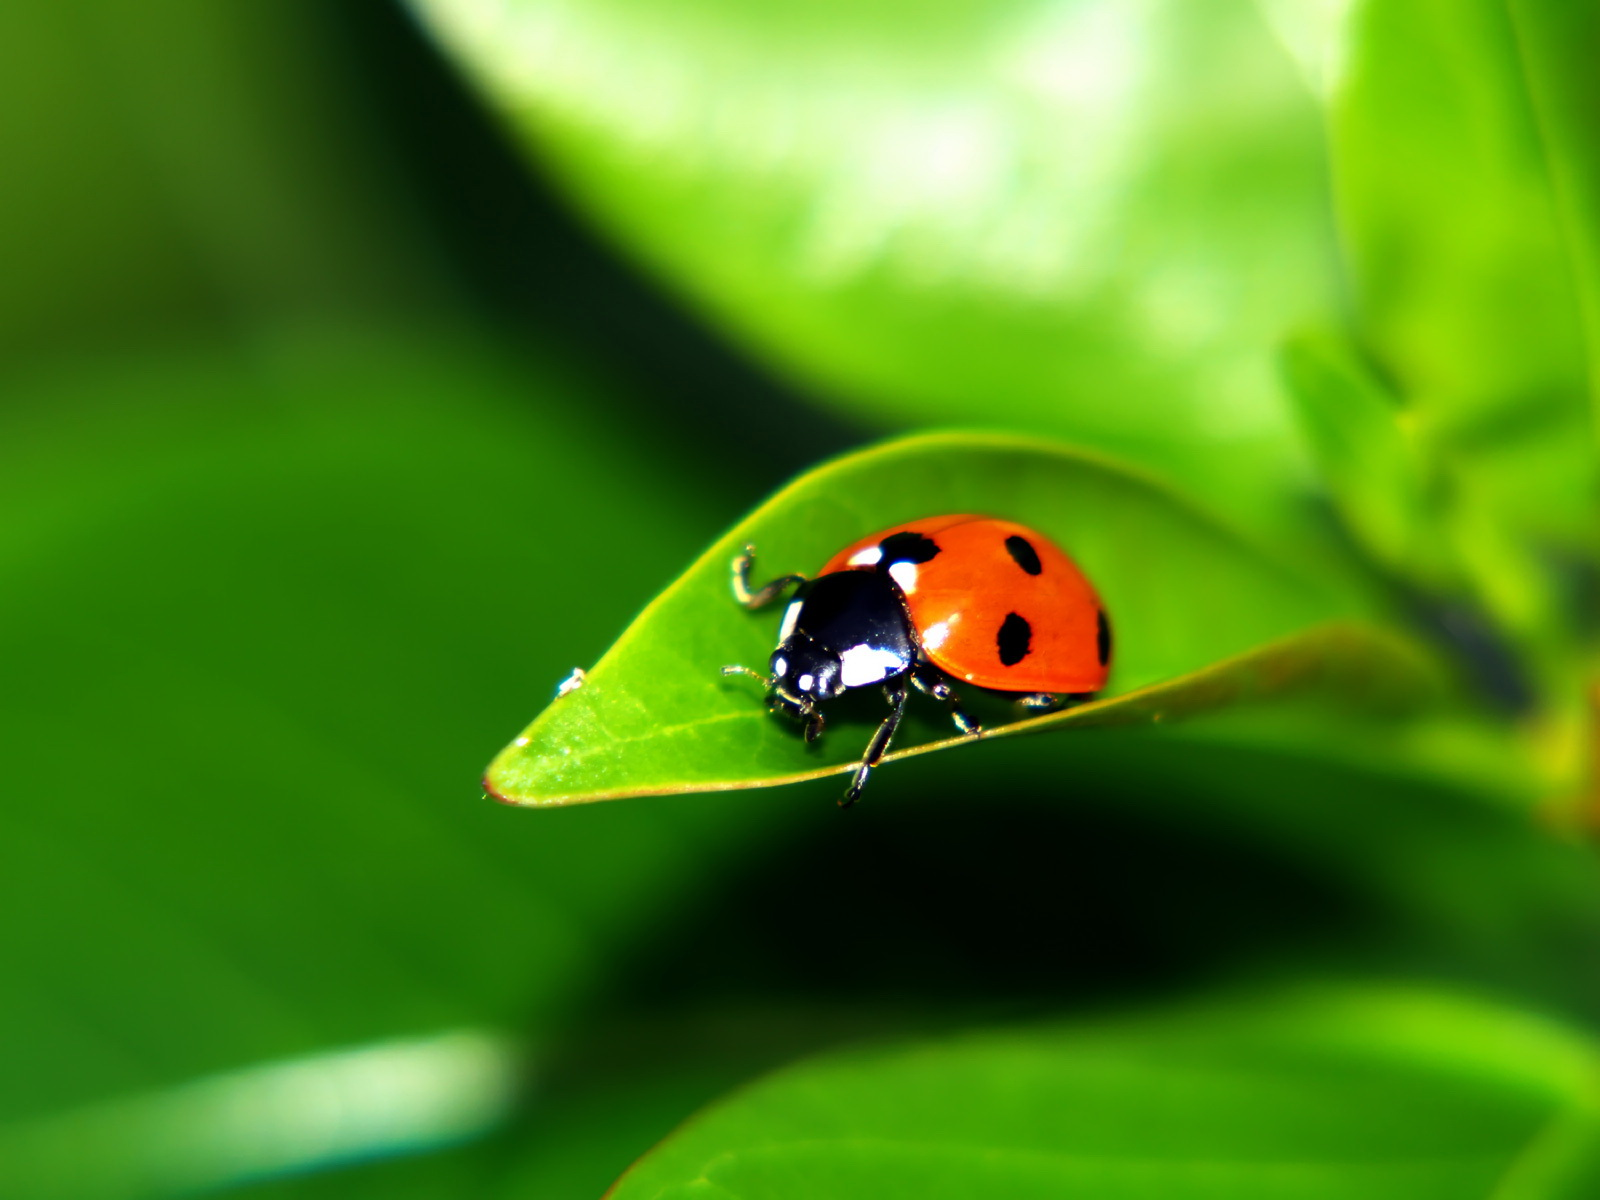 http://3.bp.blogspot.com/-nGUceQ0tzh4/TyW0LkF_waI/AAAAAAAABEM/uzCUtZTQoPA/s1600/Cute+Ladybug+Wallpapers.jpg